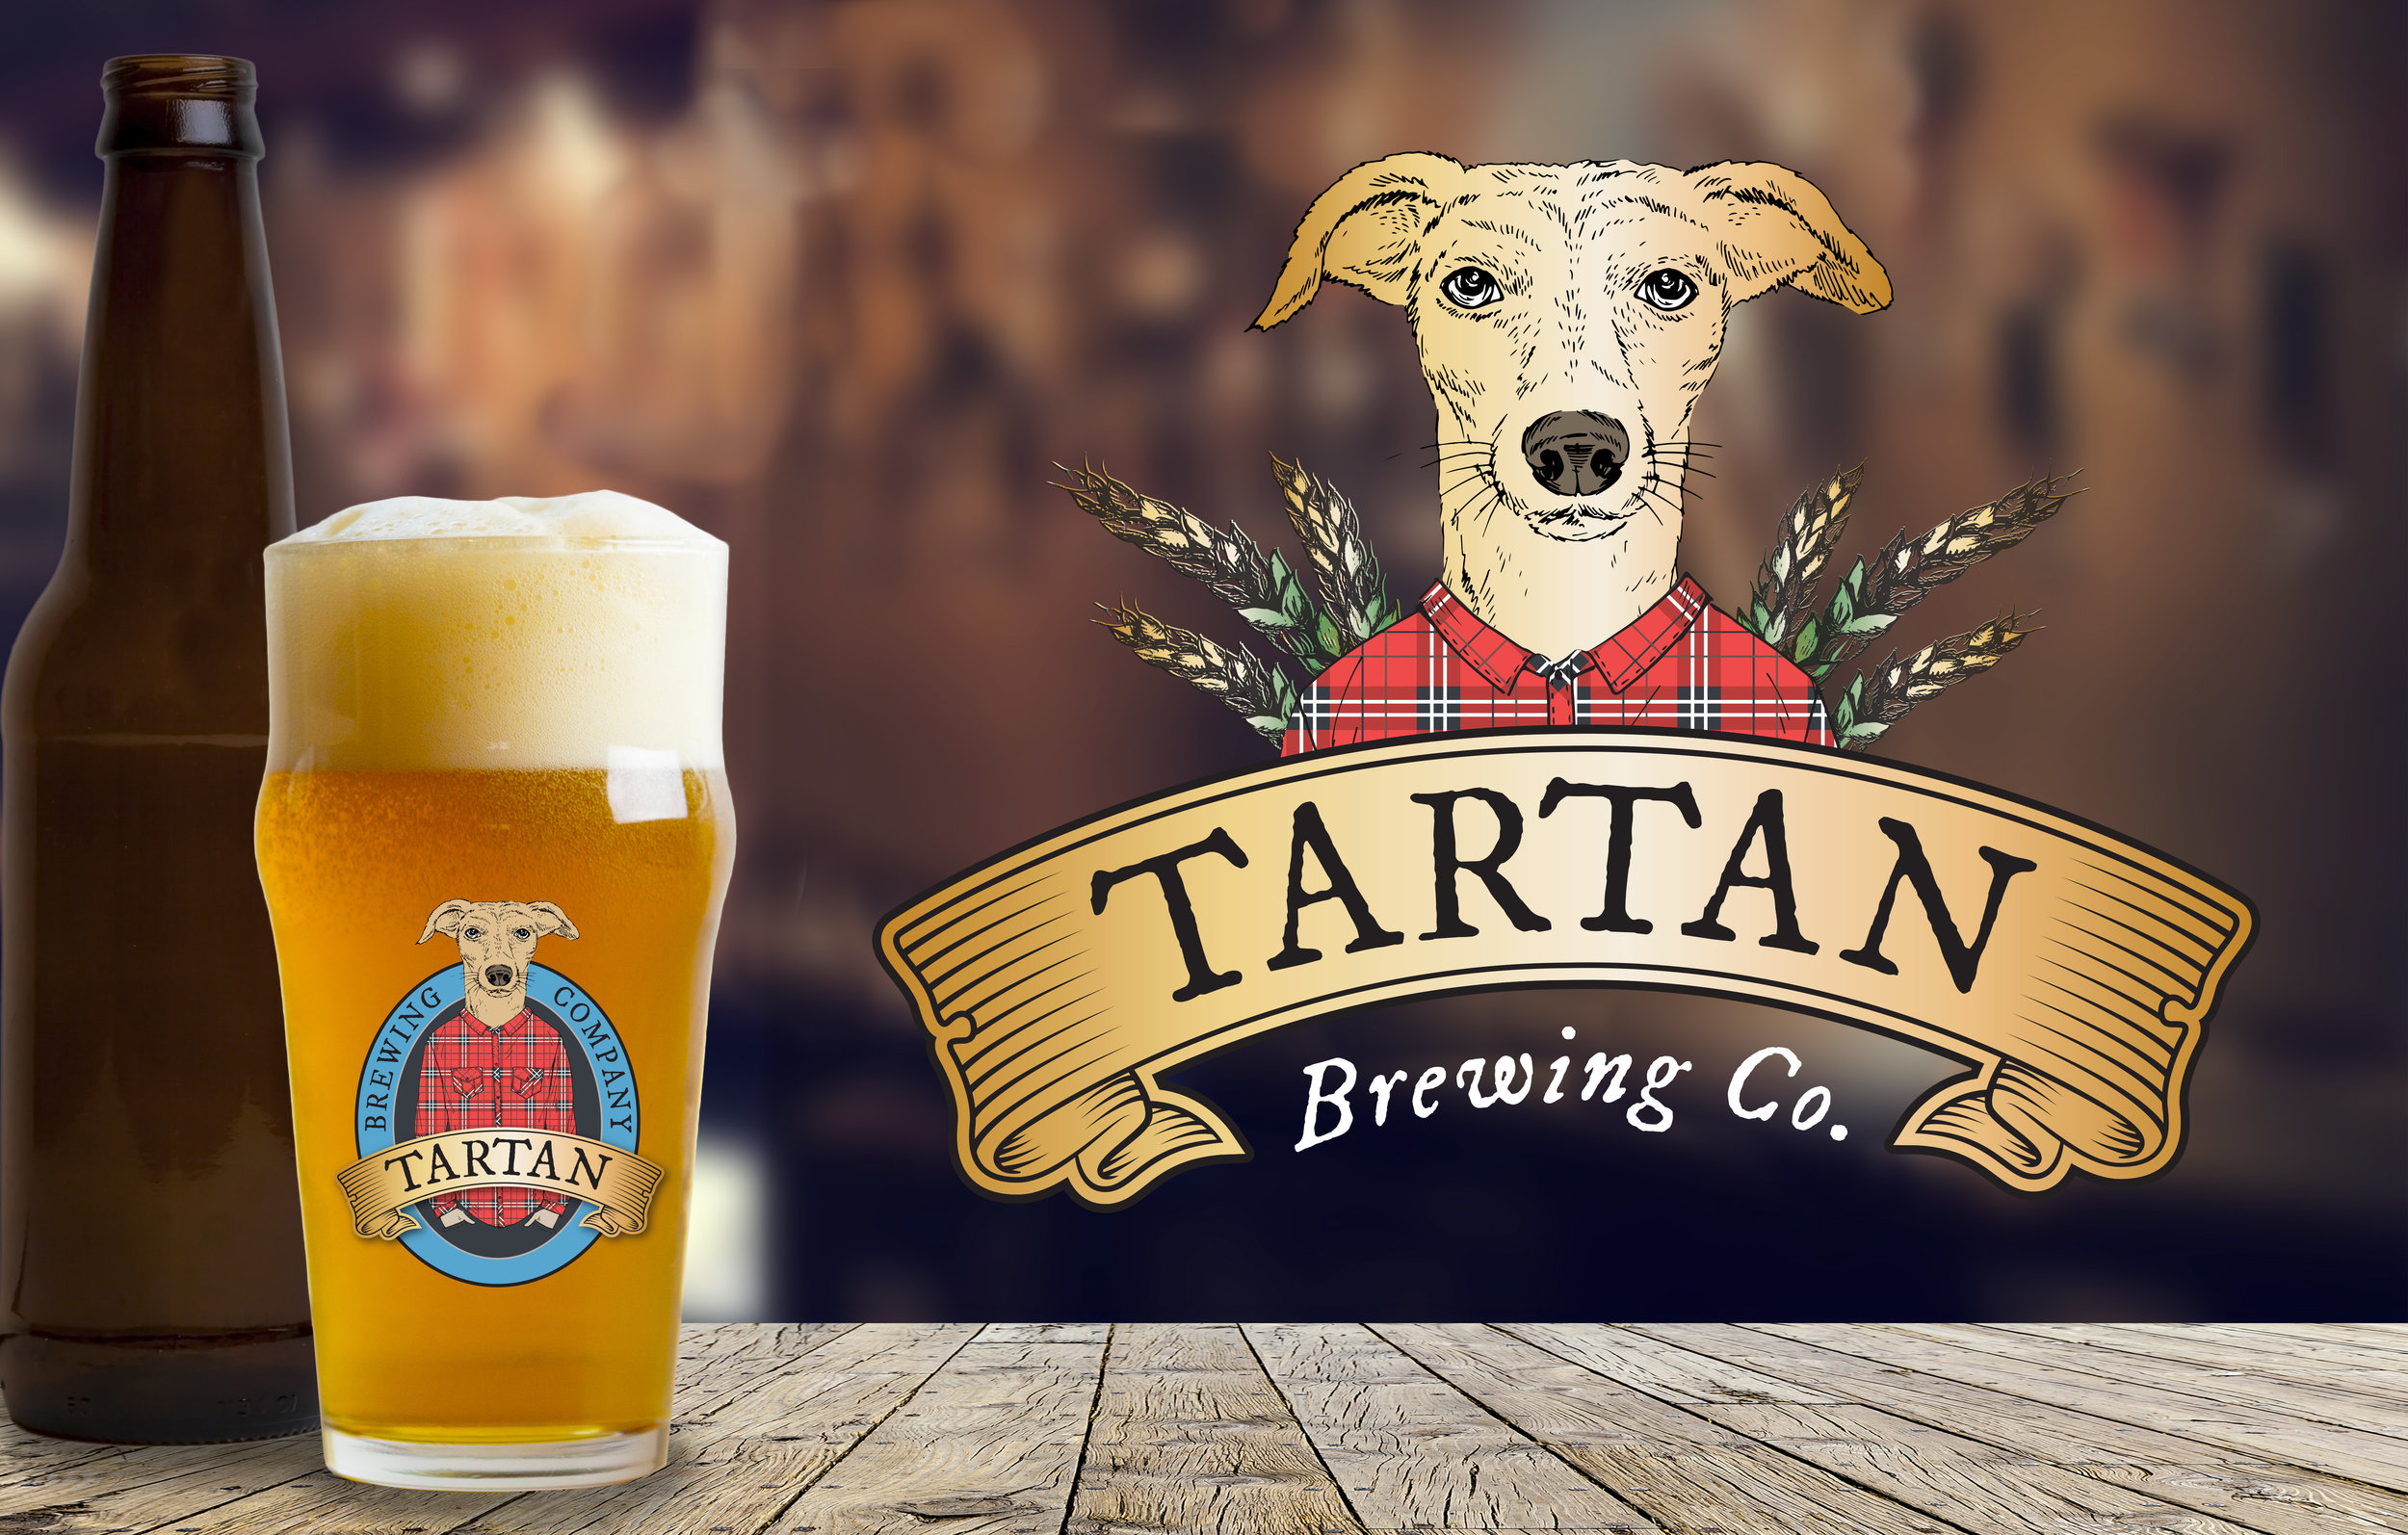 Tartan Brewing Co.